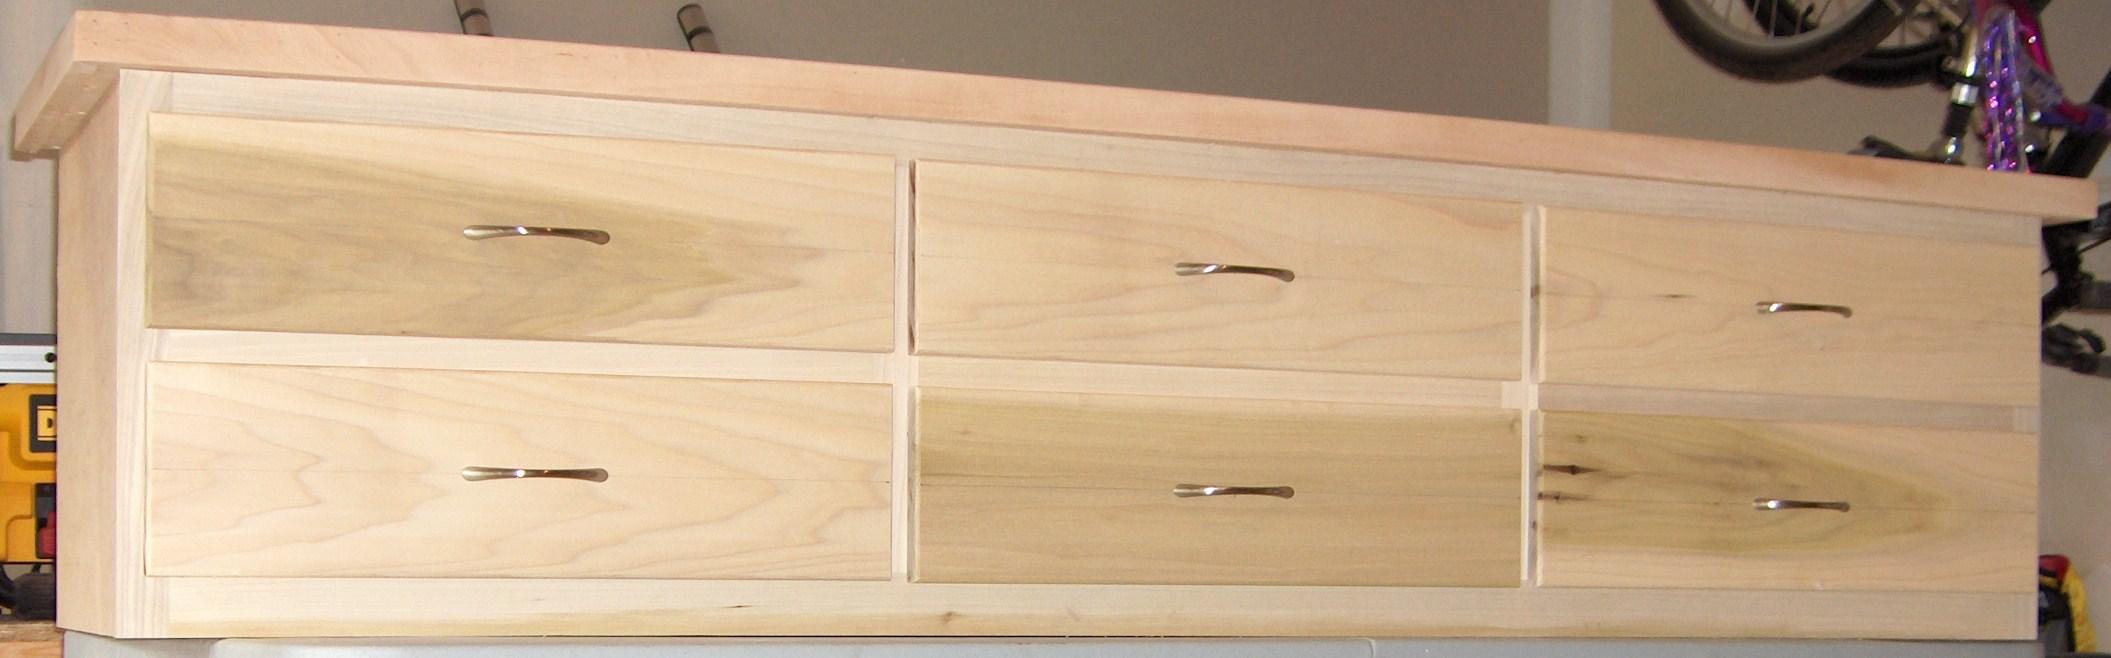 Dresser With Cabinet Bench Cabinet Dresser 1 By Hearte42 On Deviantart